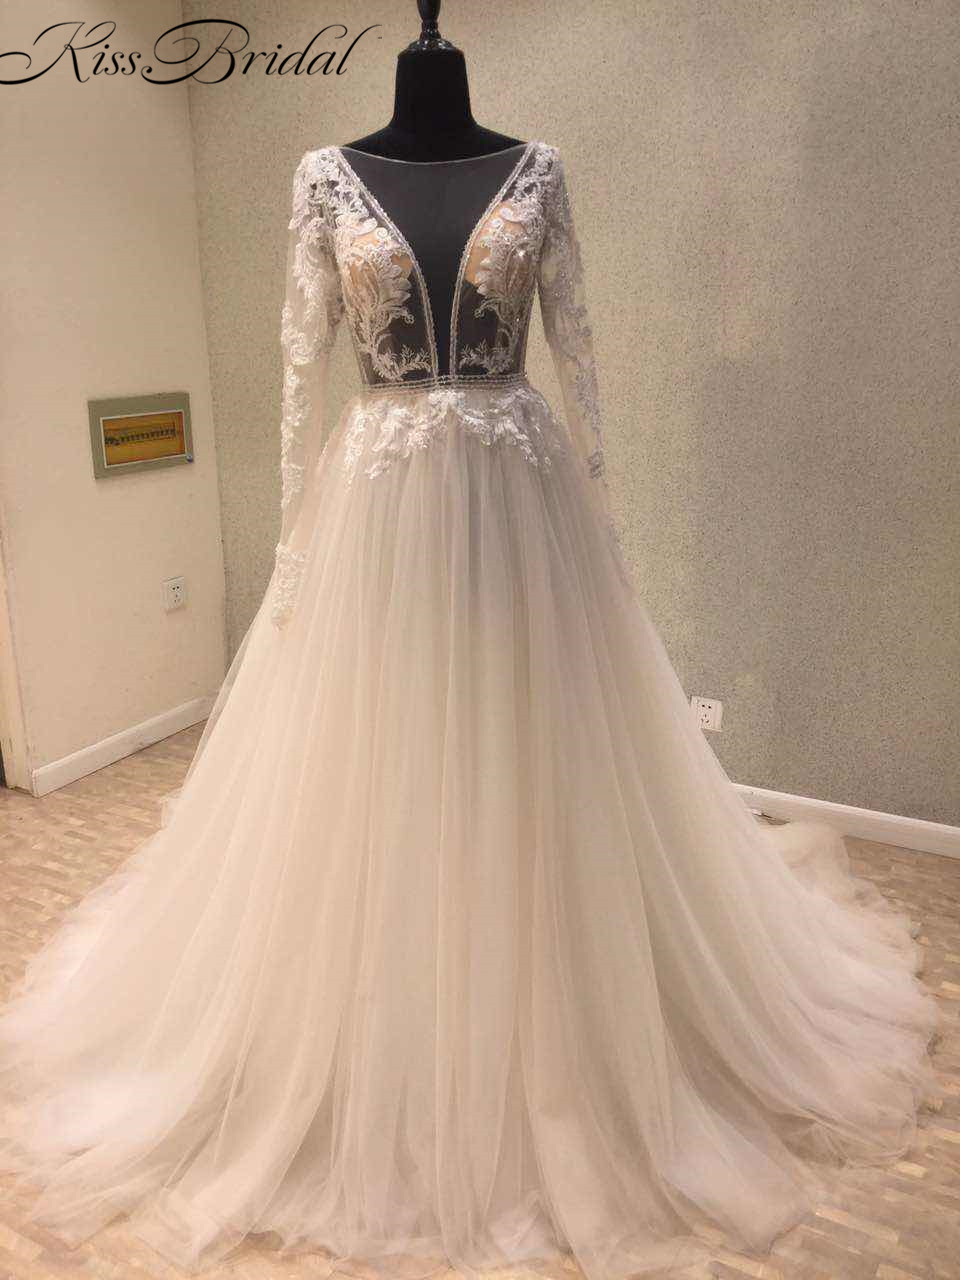 2018 Modest Wedding Dresses Long Sleeve Sexy Backless Appliqued Tulle Bride Wedding Gowns Vestido de noiva